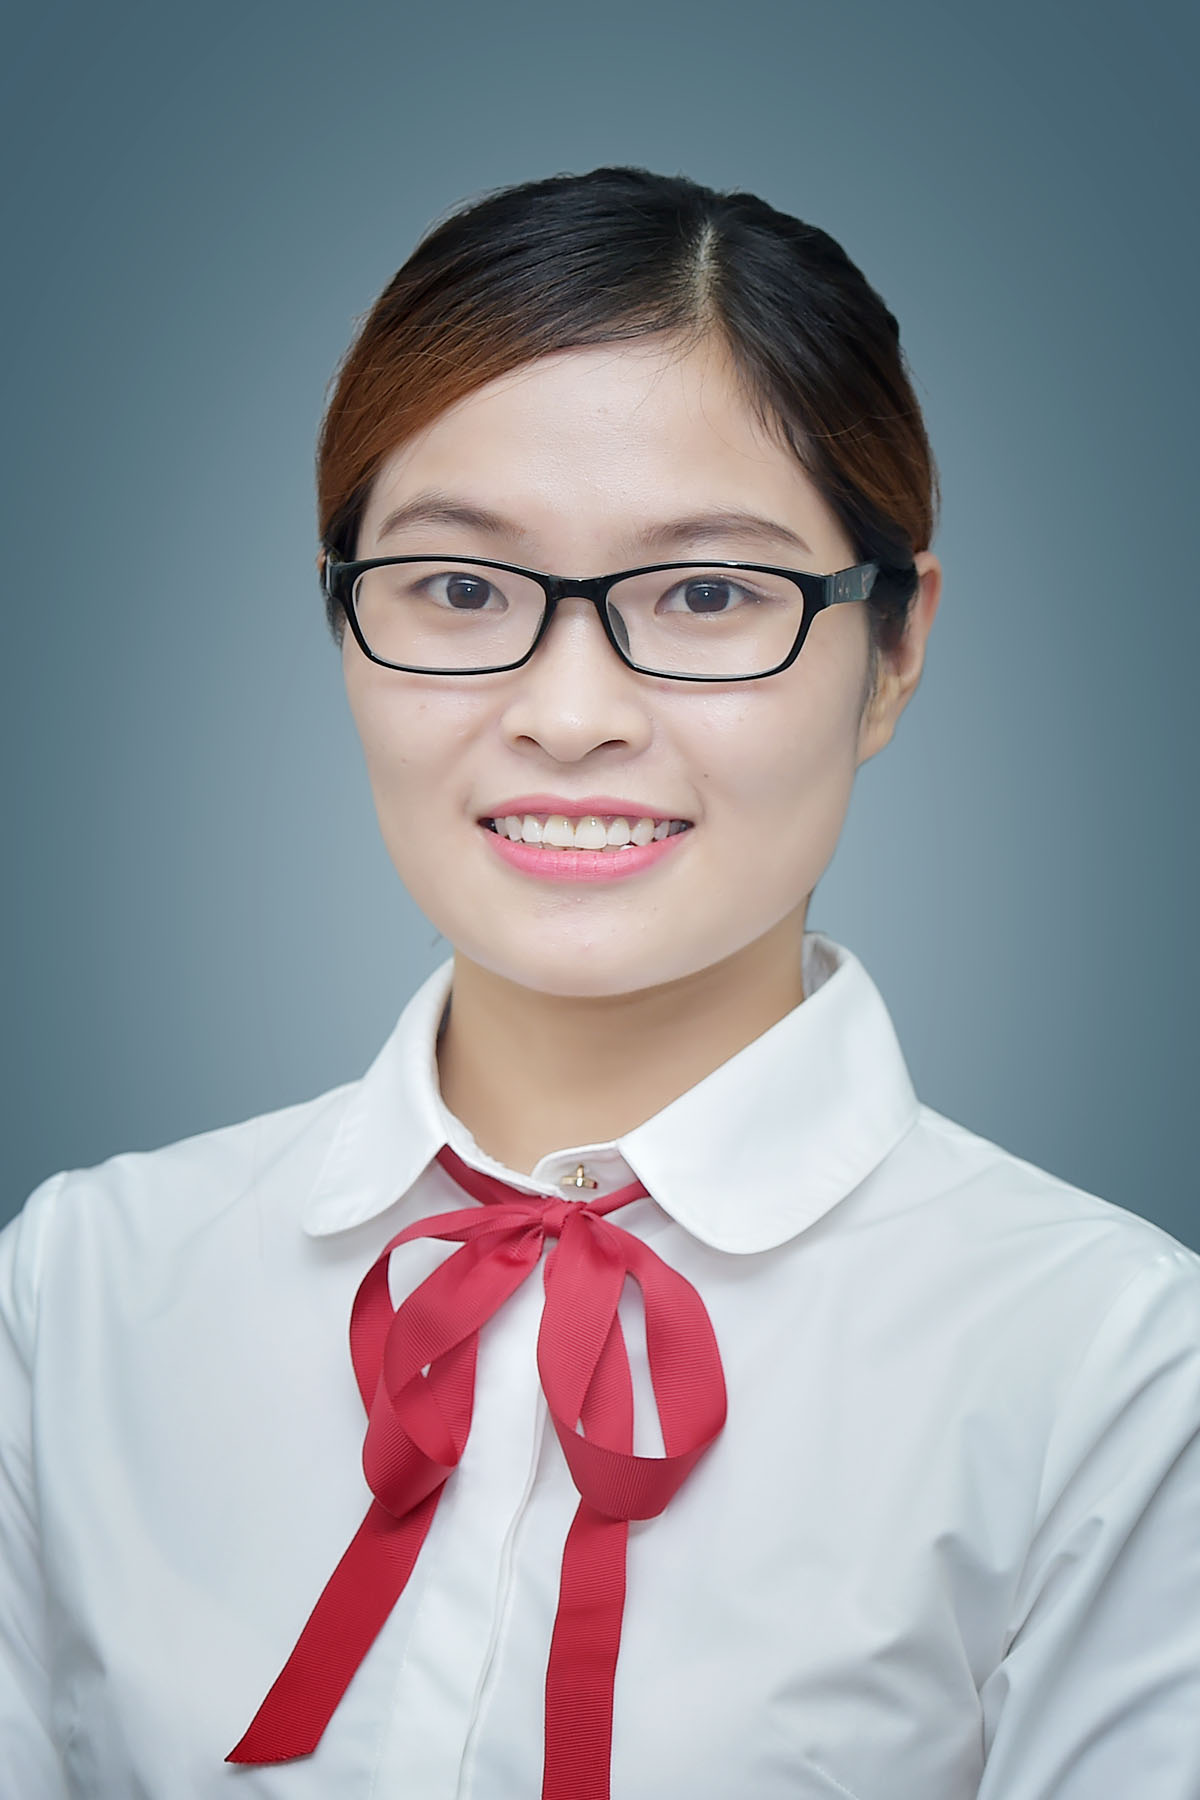 Cô Nguyễn Thị Kiều Hoa